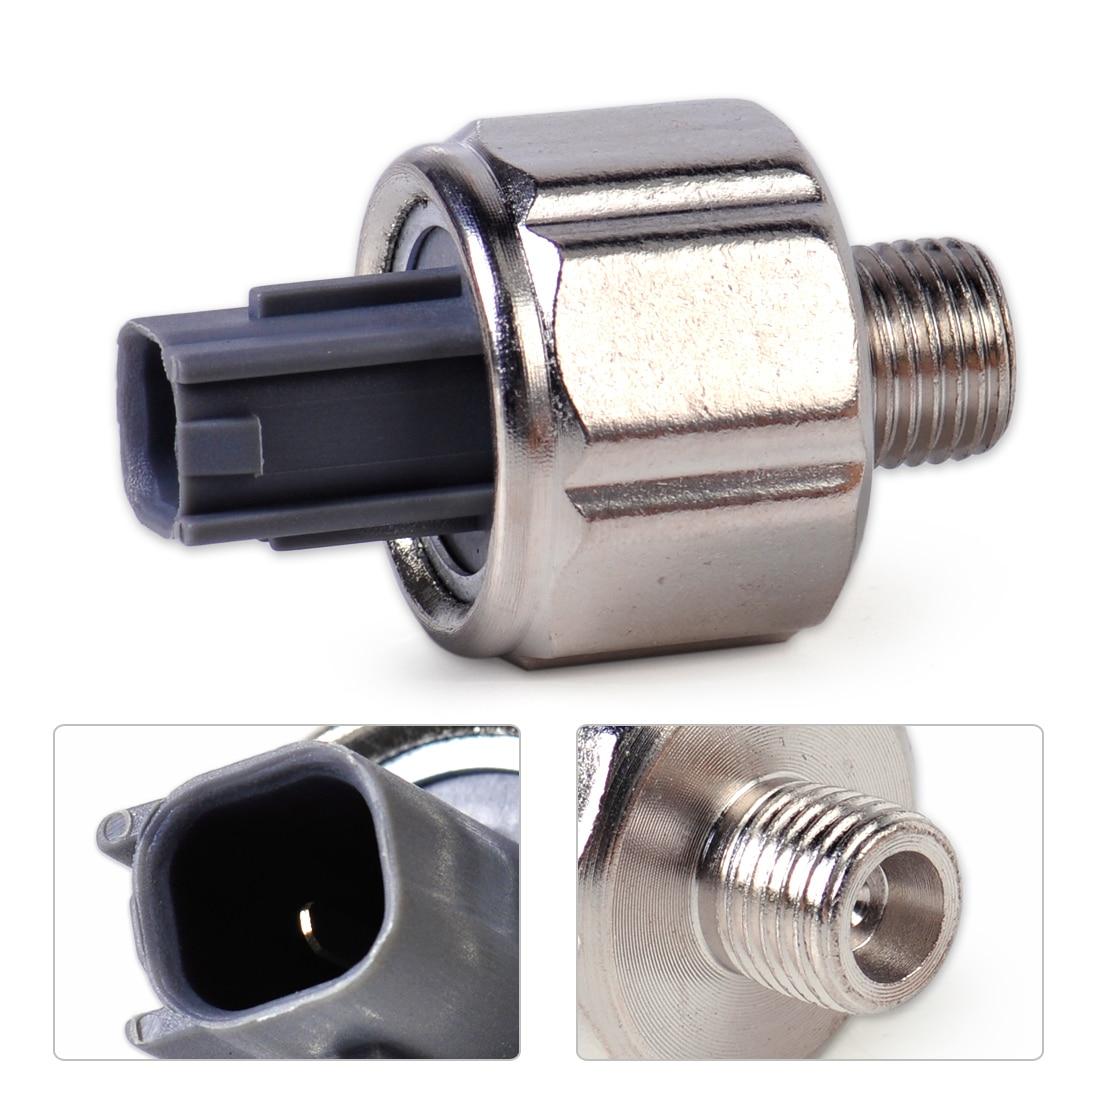 dwcx engine knock sensor 89615 12040 ks81 su4040 5s2249 for toyota camry 4runner tacoma lexus. Black Bedroom Furniture Sets. Home Design Ideas